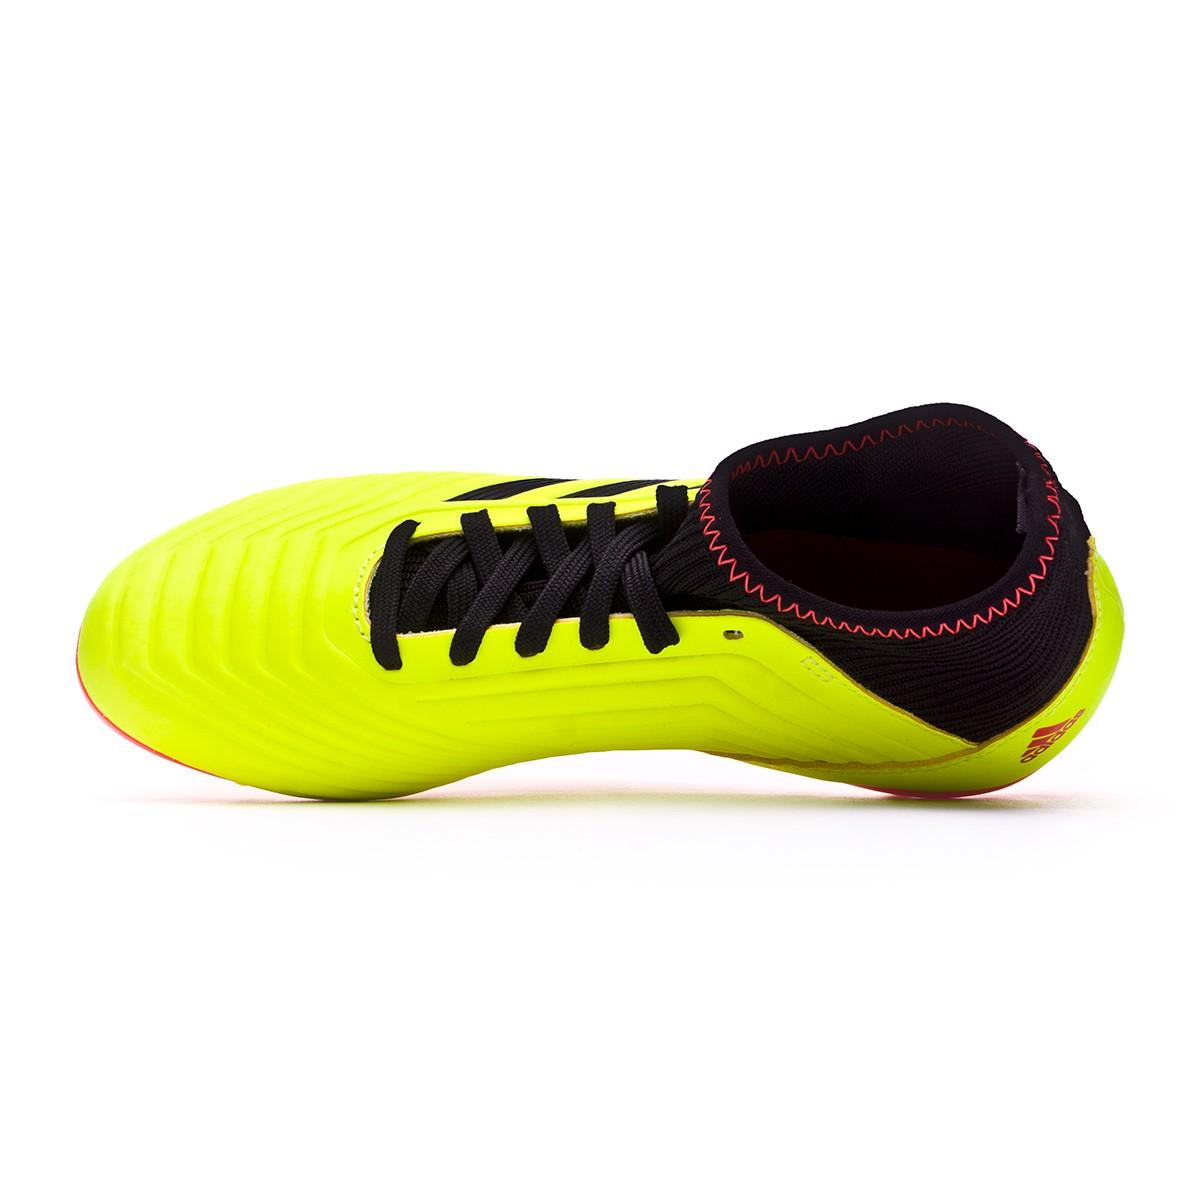 376d250030e Football Boots adidas Kids Predator 18.3 AG Solar yellow-Black-Solar red -  Football store Fútbol Emotion